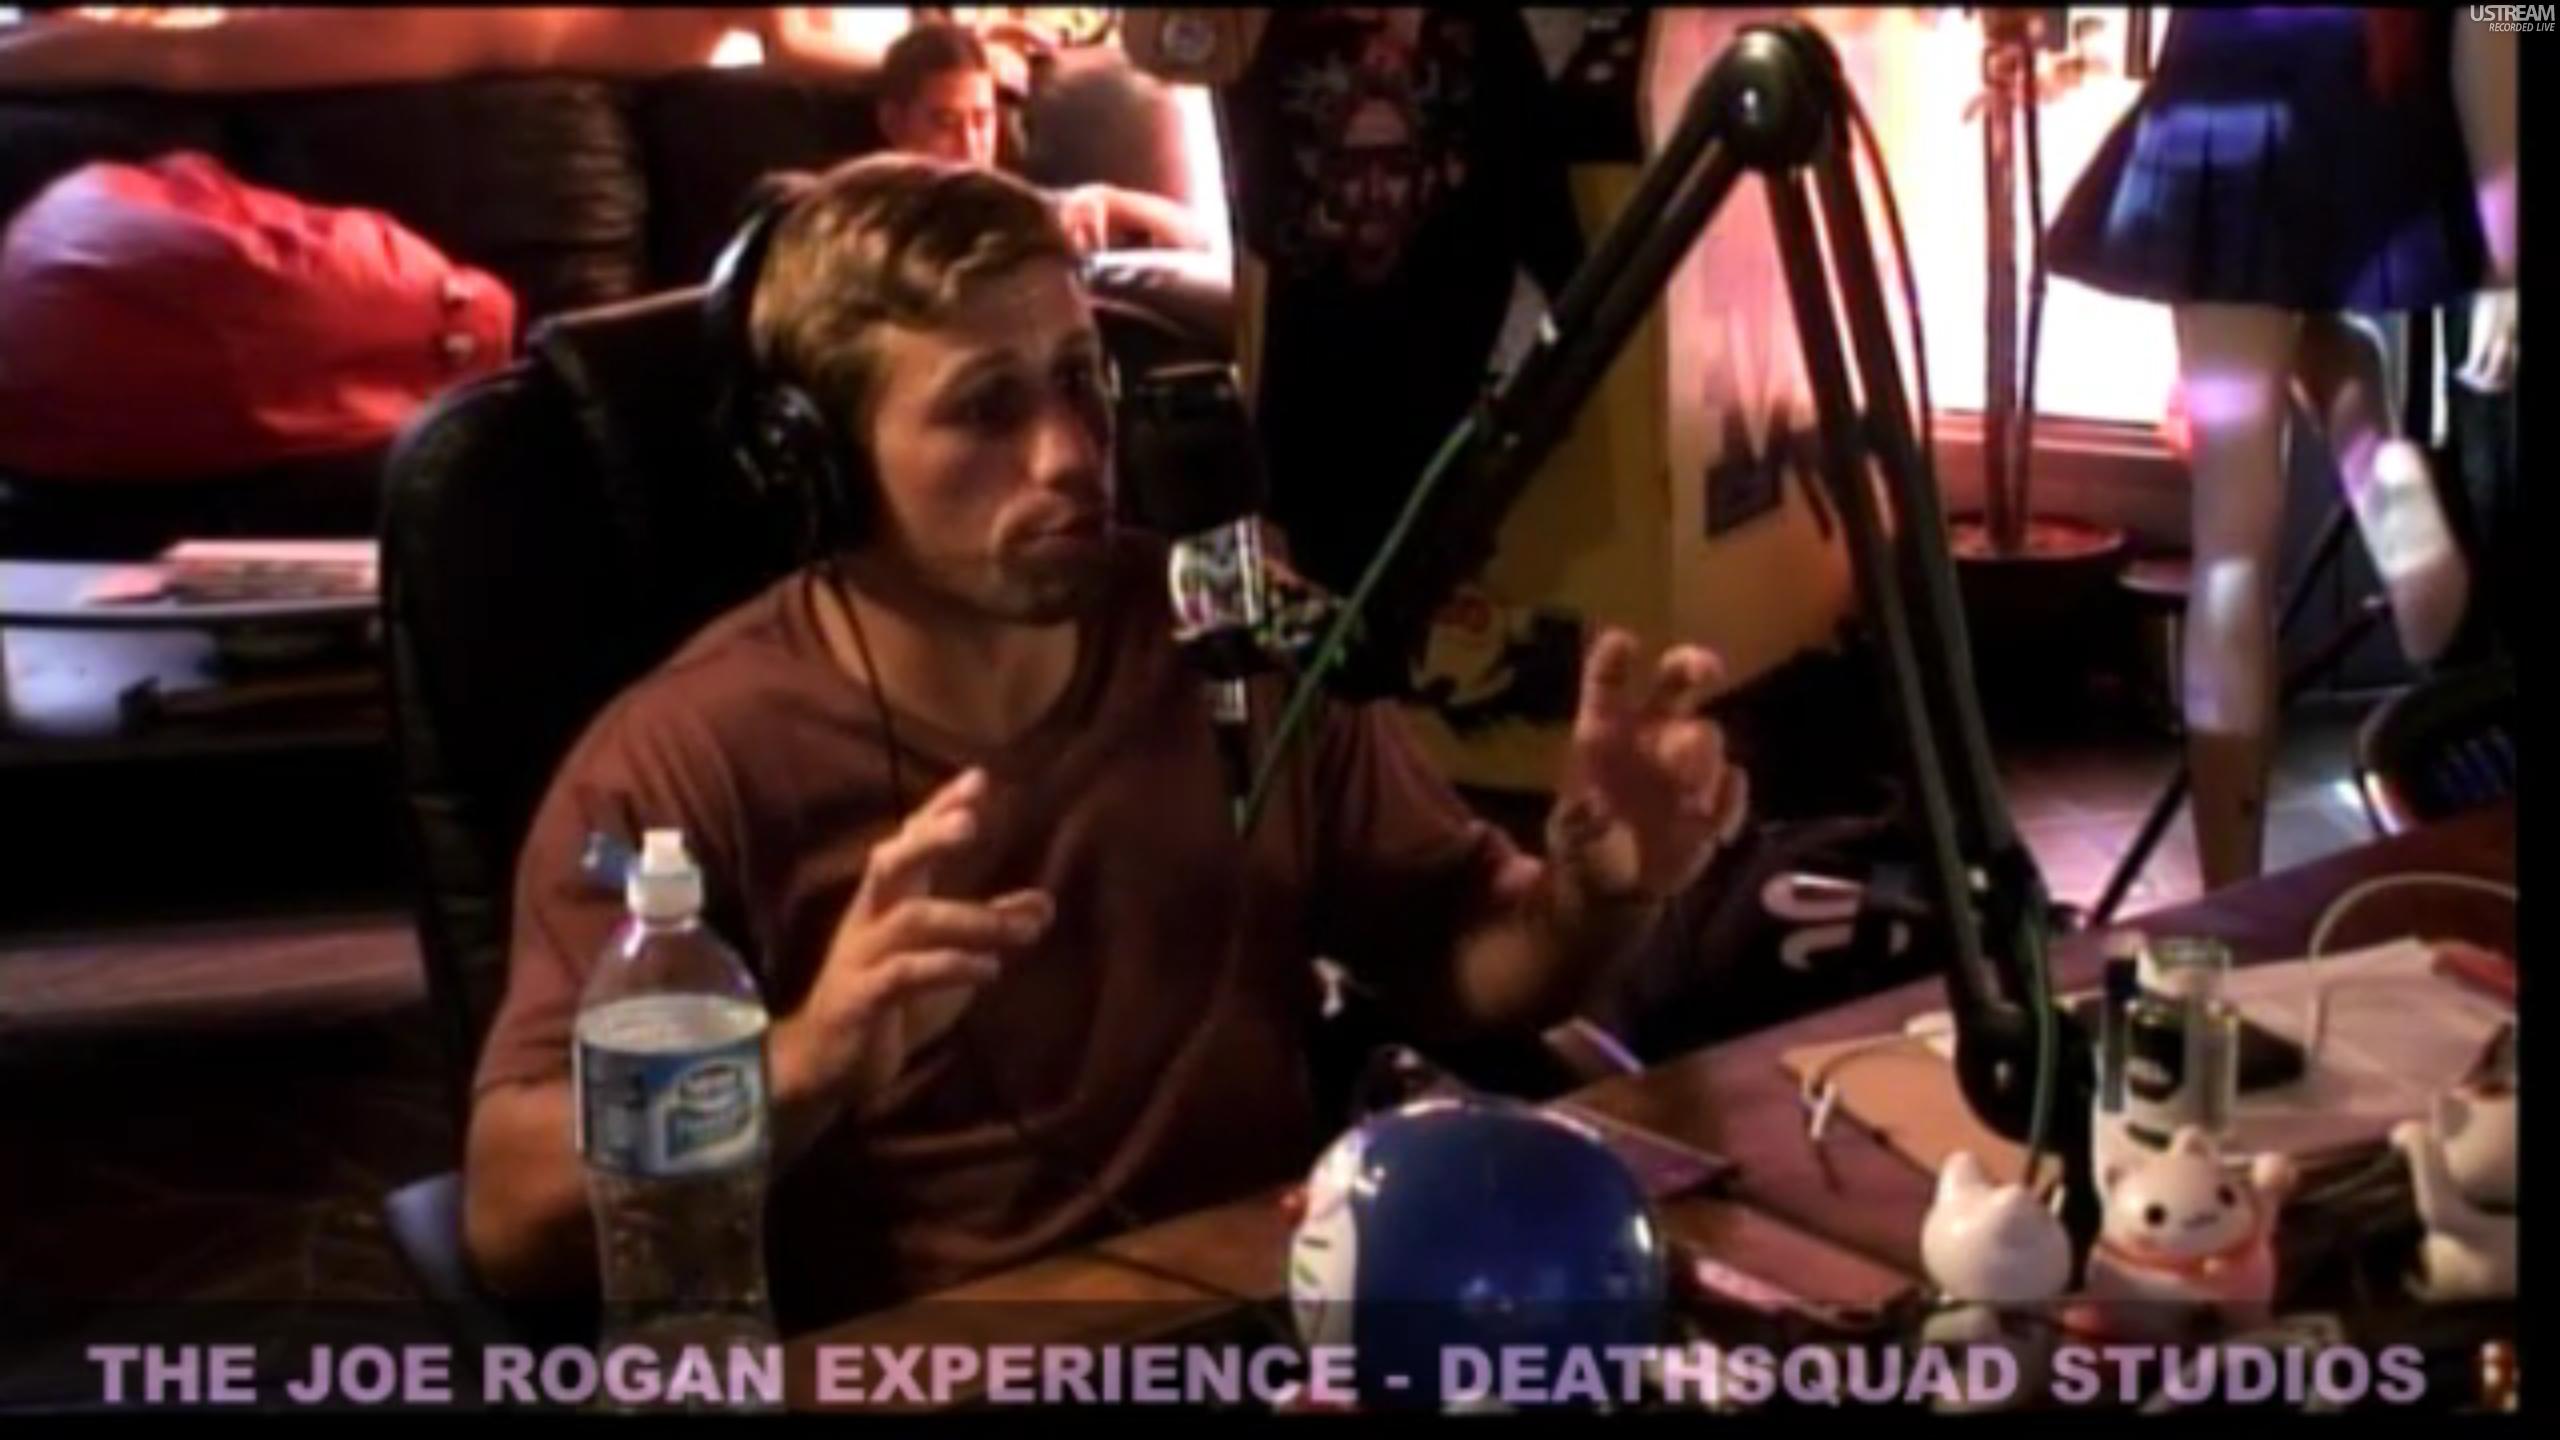 The Joe Rogan Experience #225 - Urijah Faber, Brian Redban